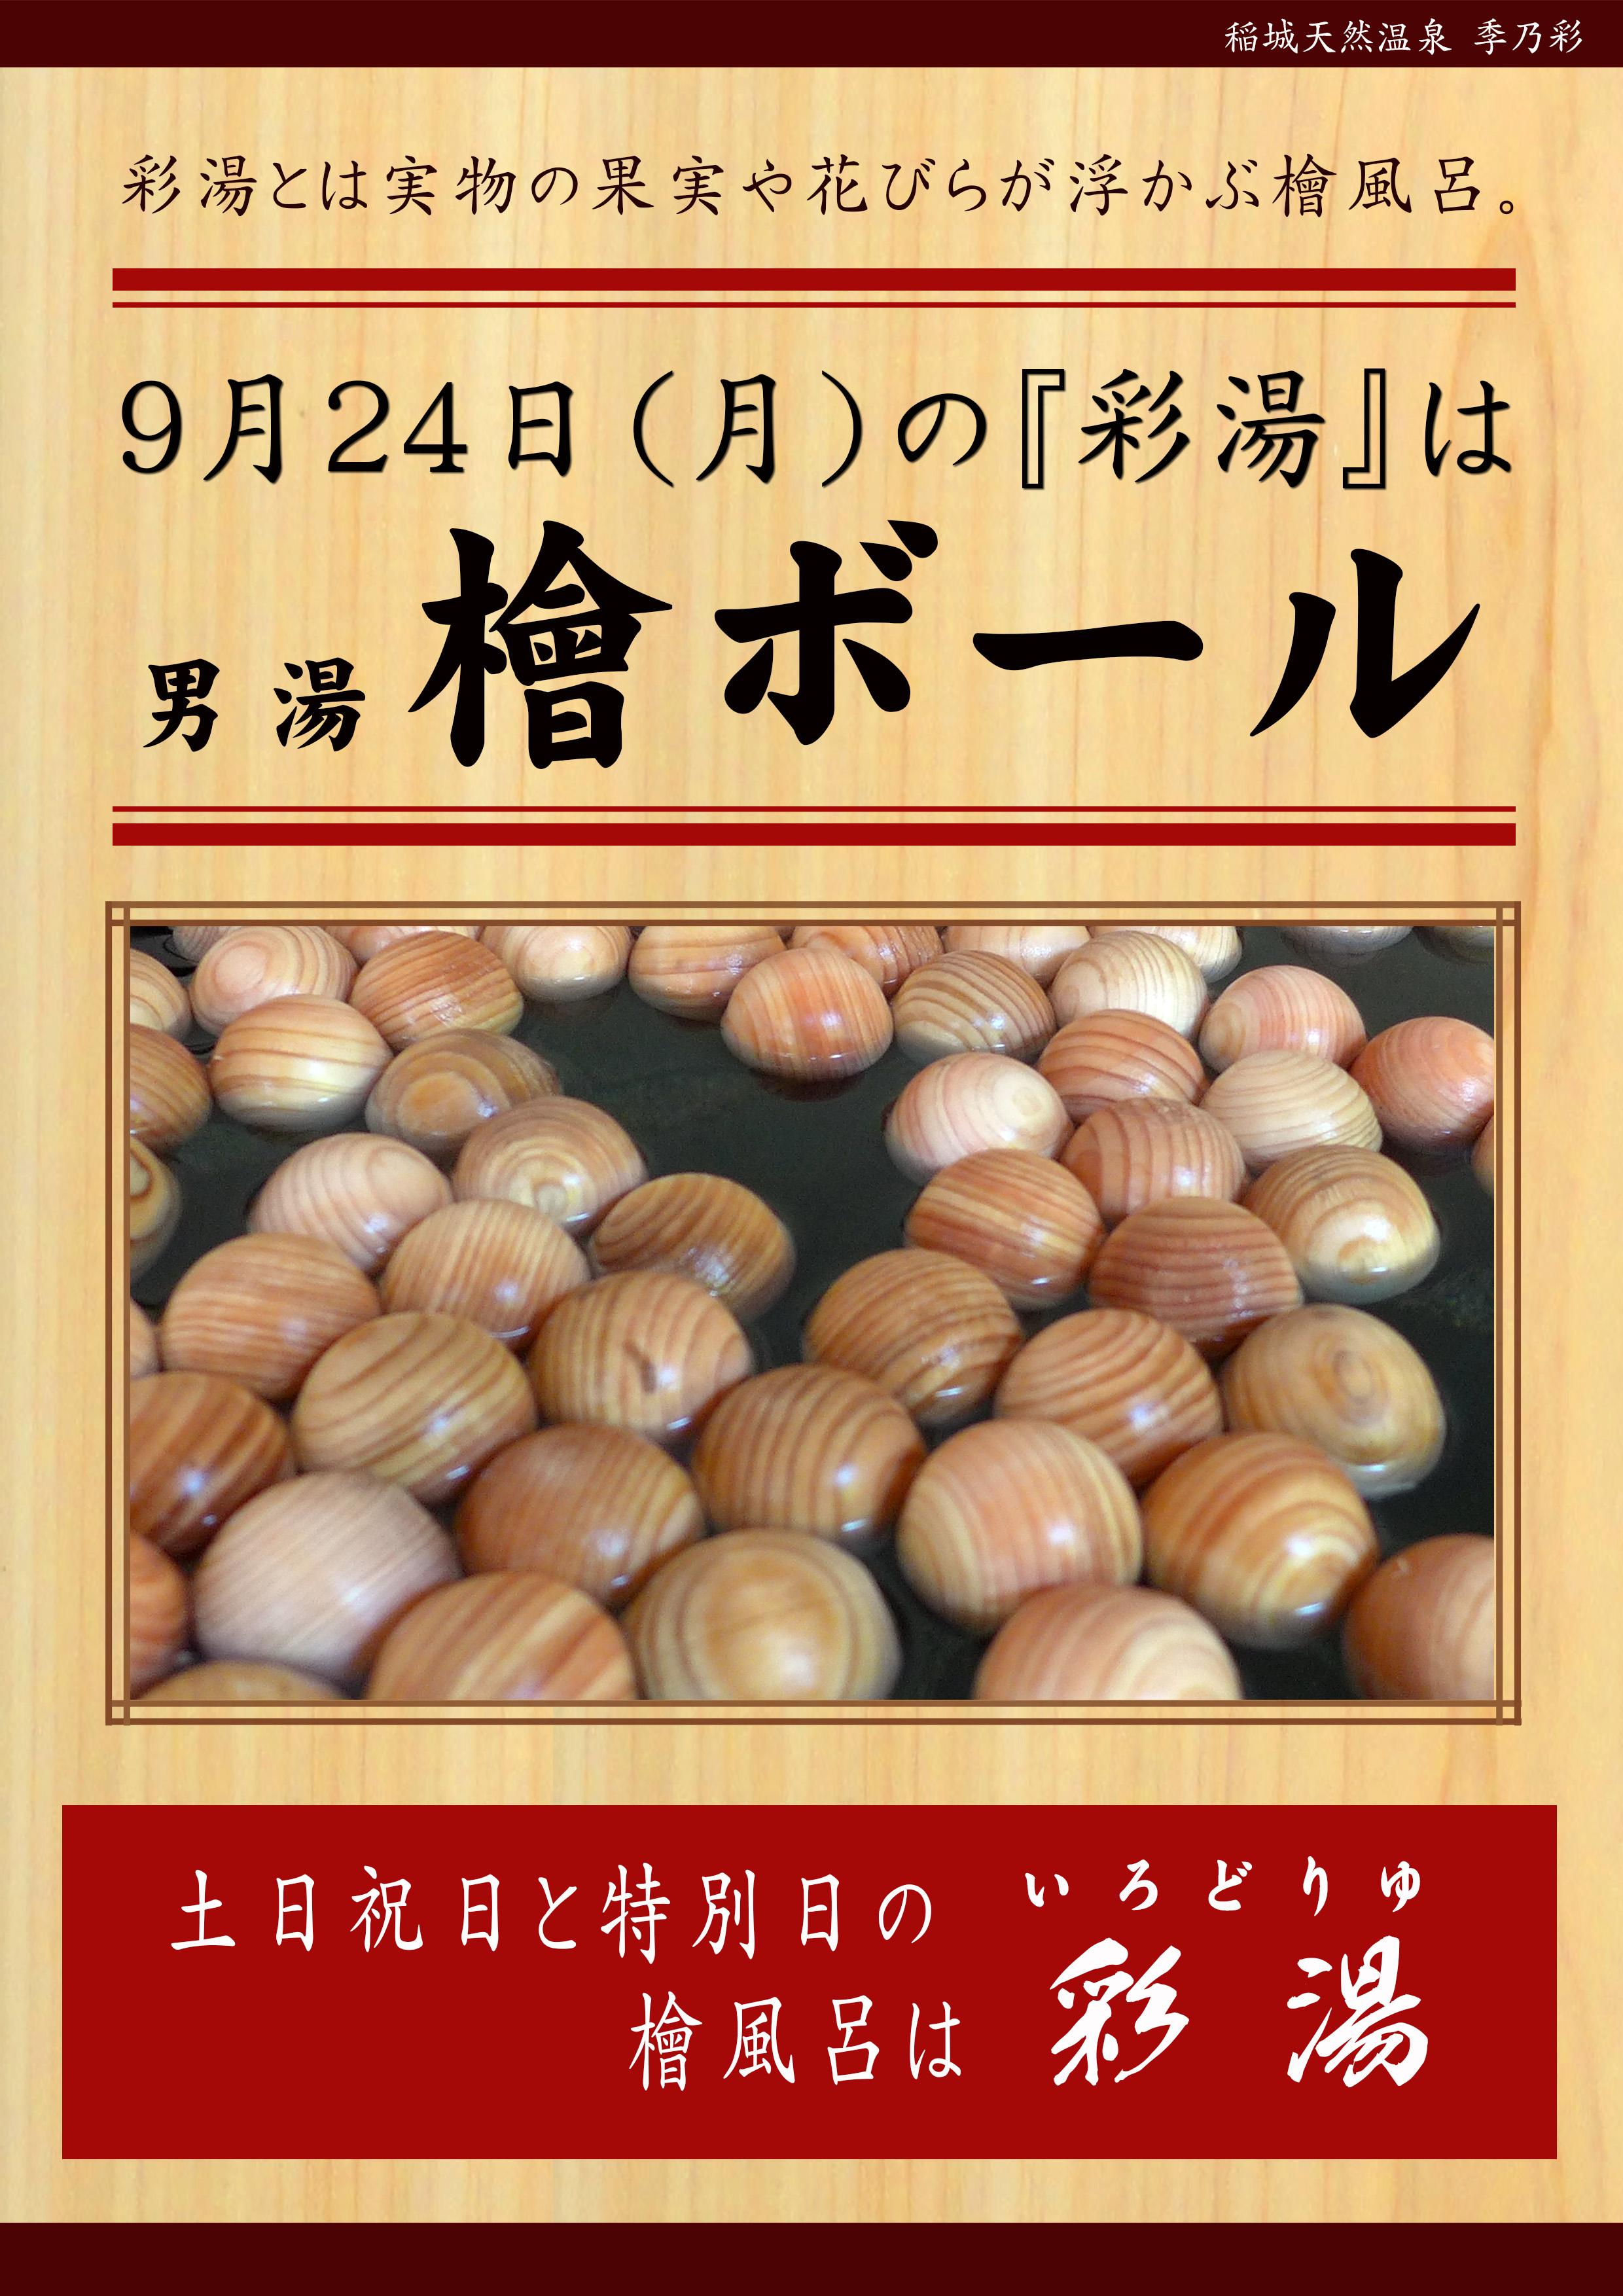 20180924POP イベント 彩湯 男湯 檜ボール